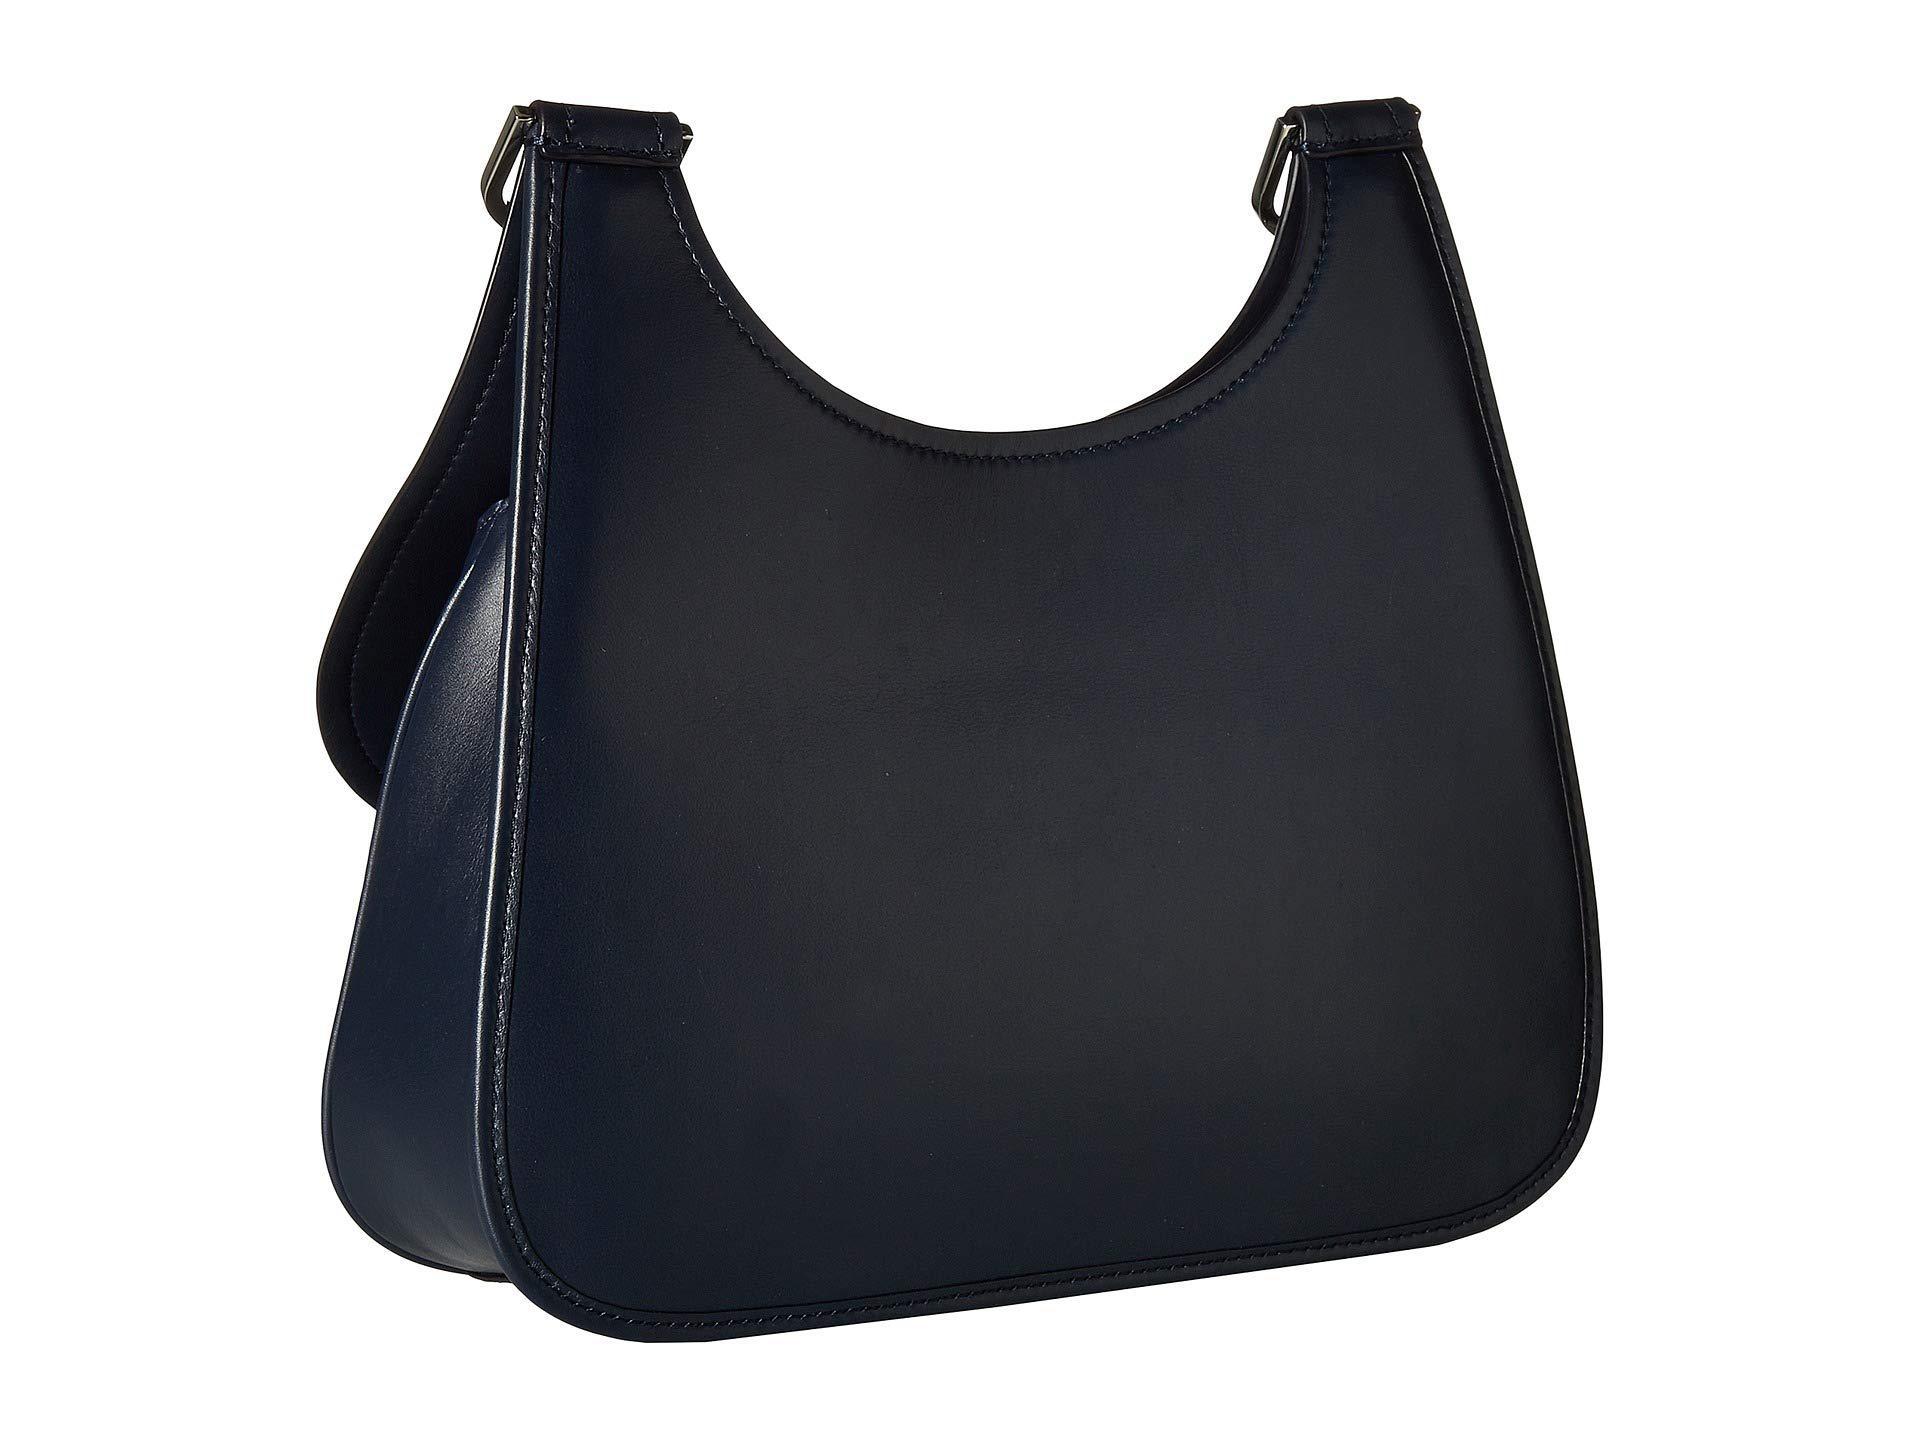 68b3f92da86 Tory Burch - Blue James Saddlebag (moose) Handbags - Lyst. View fullscreen